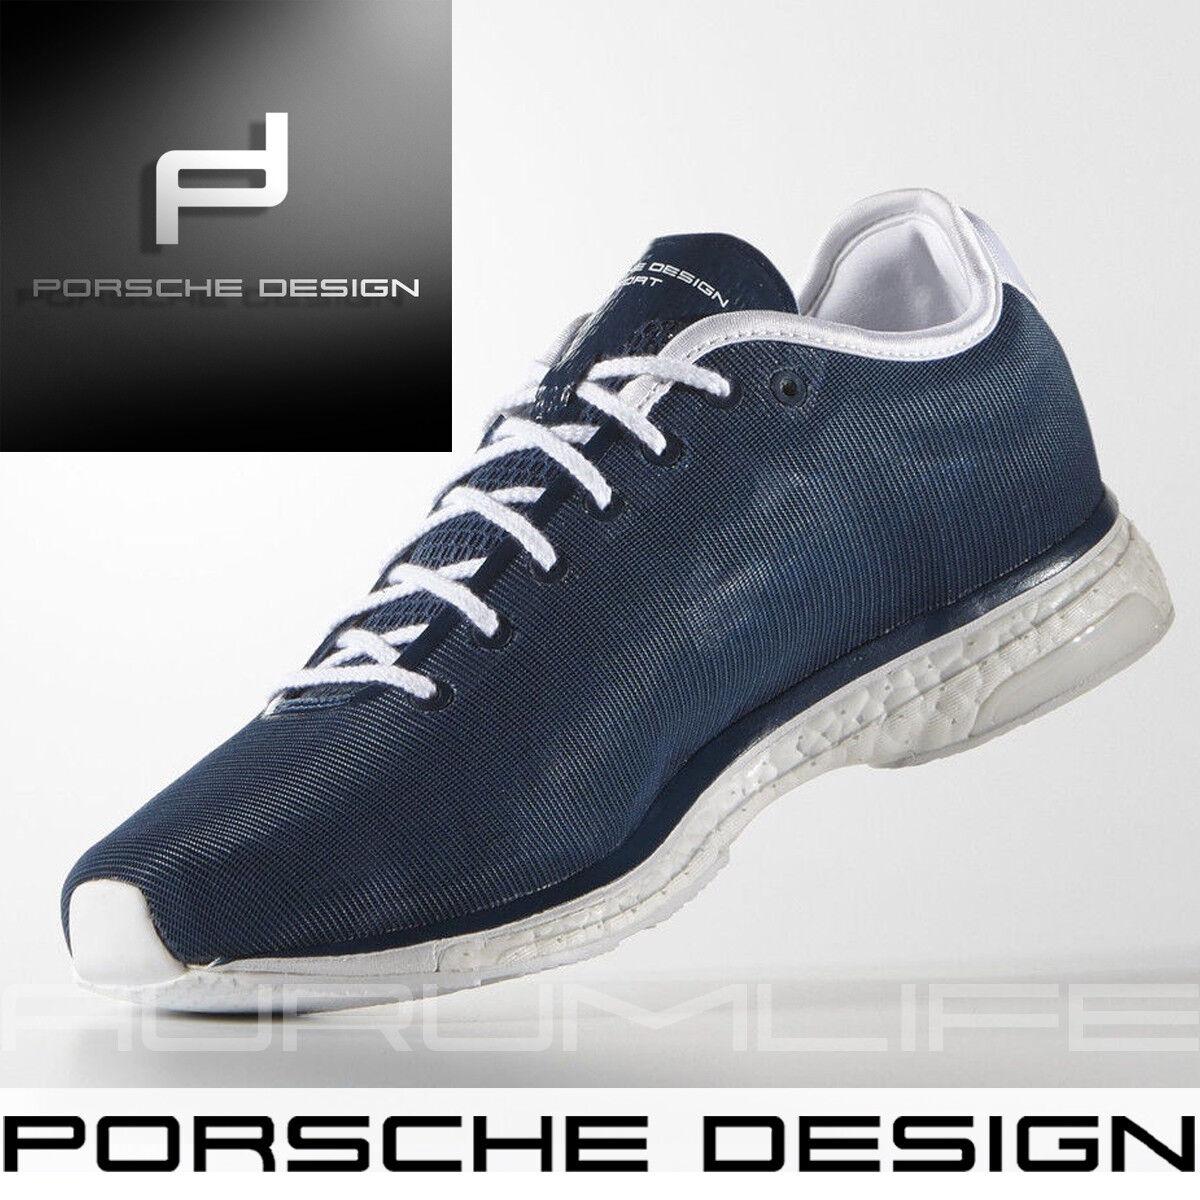 Adidas Porsche Design schuhe Mens Run Blau Reflective Boost af4407 Ultra UK 9.5